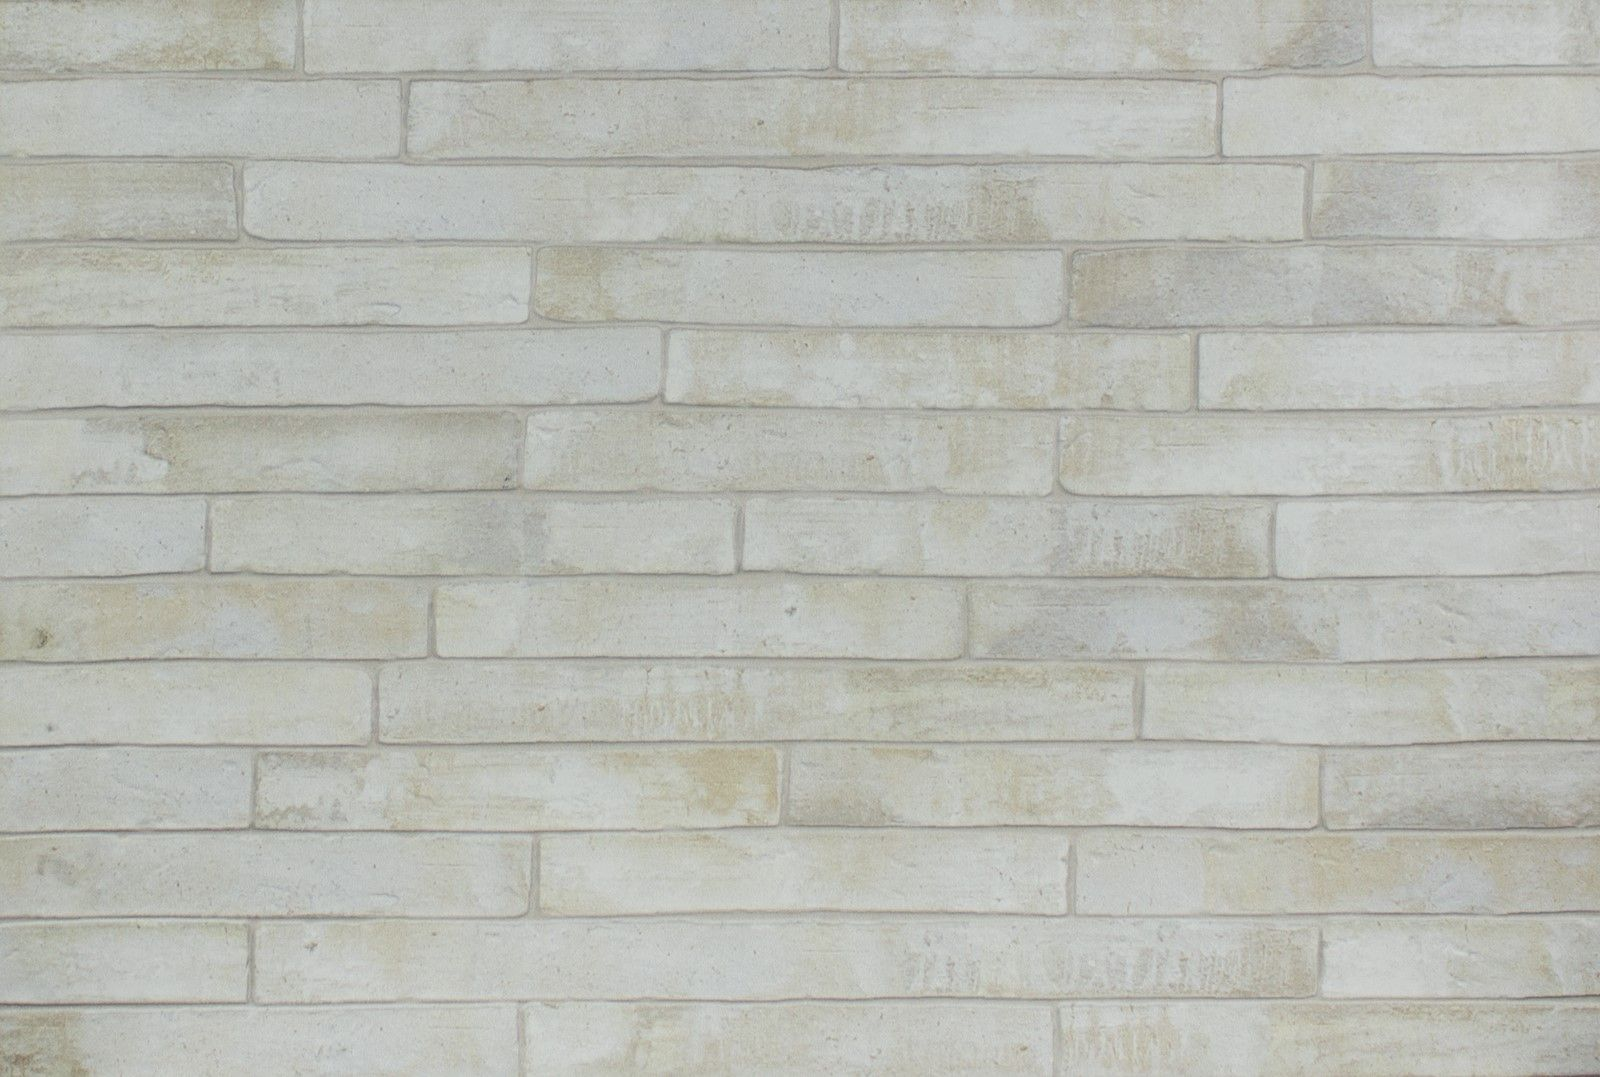 London White Brick Wall Tile | White brick walls, Wall tiles and Bricks